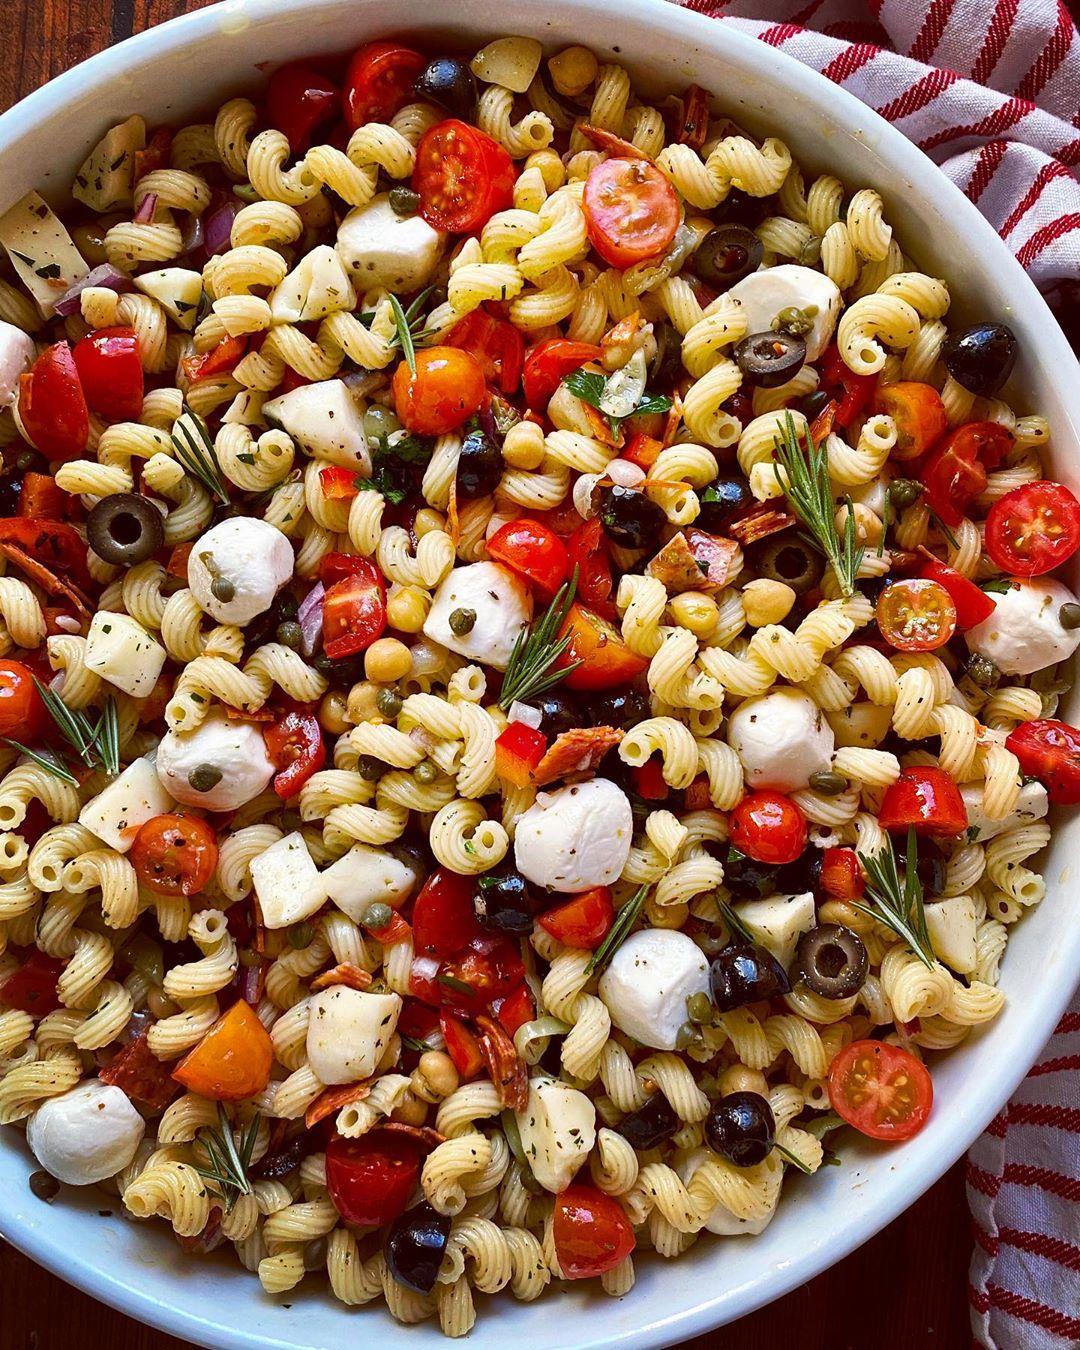 Ensalada de pasta a la italiana